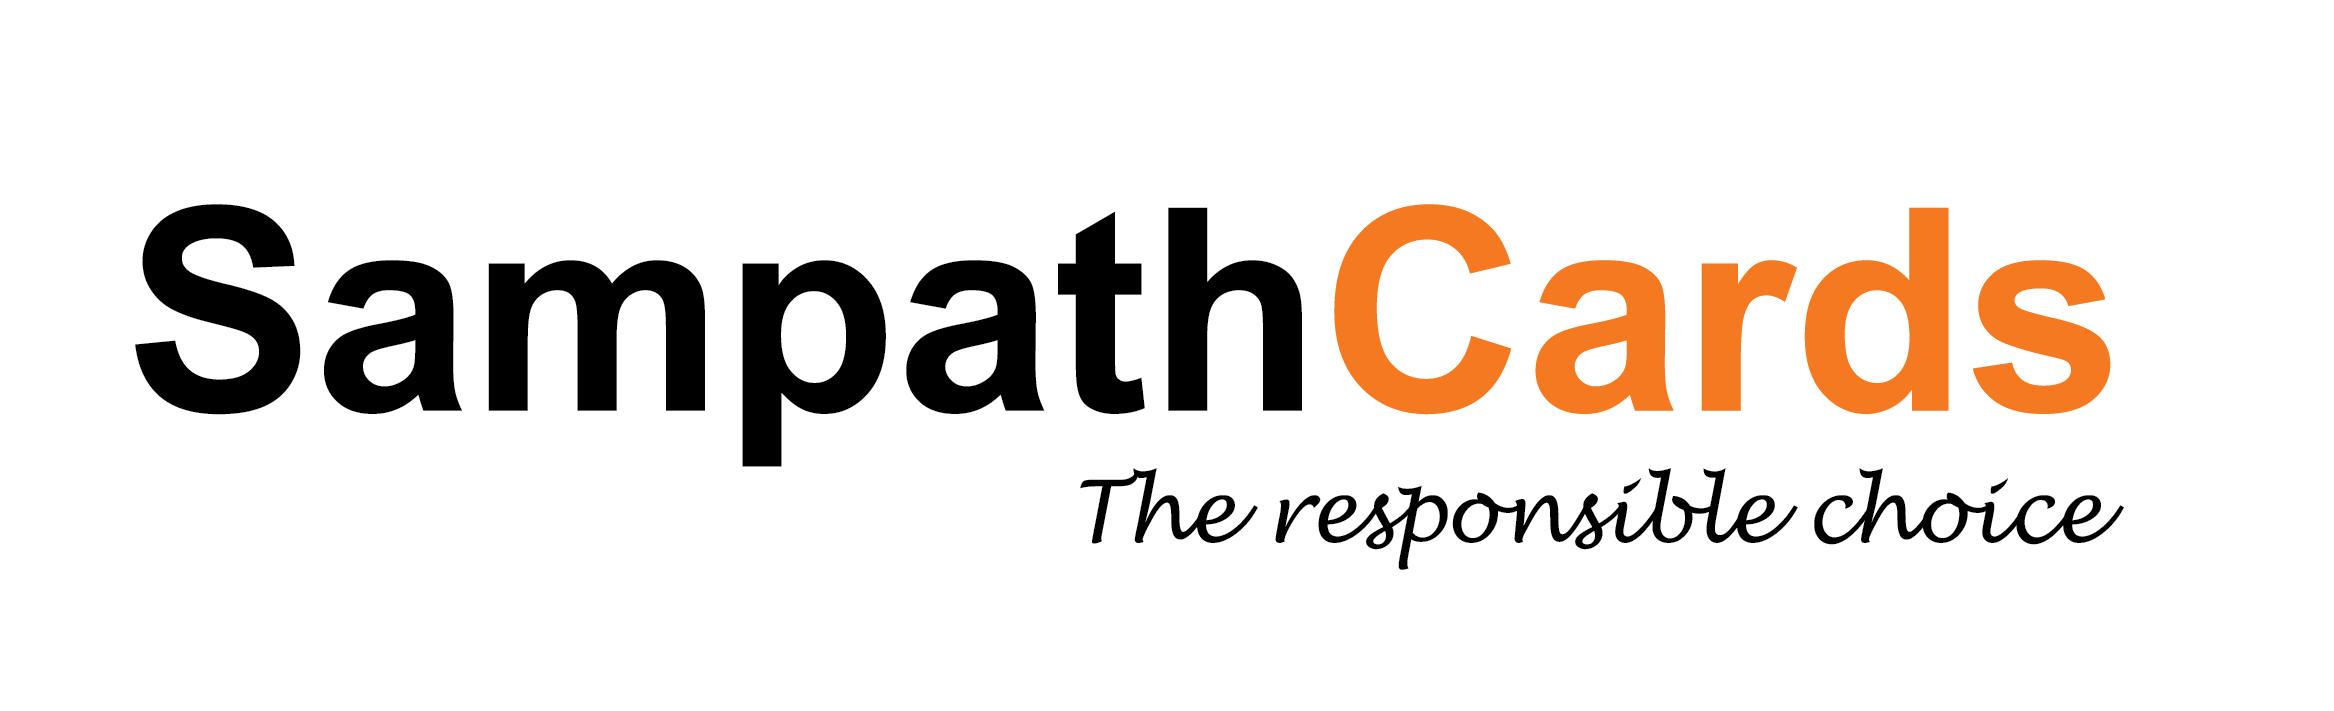 https://assets.roar.media/assets/niAvlnJllzGs1cMu_Sampath-Card-Logo.png